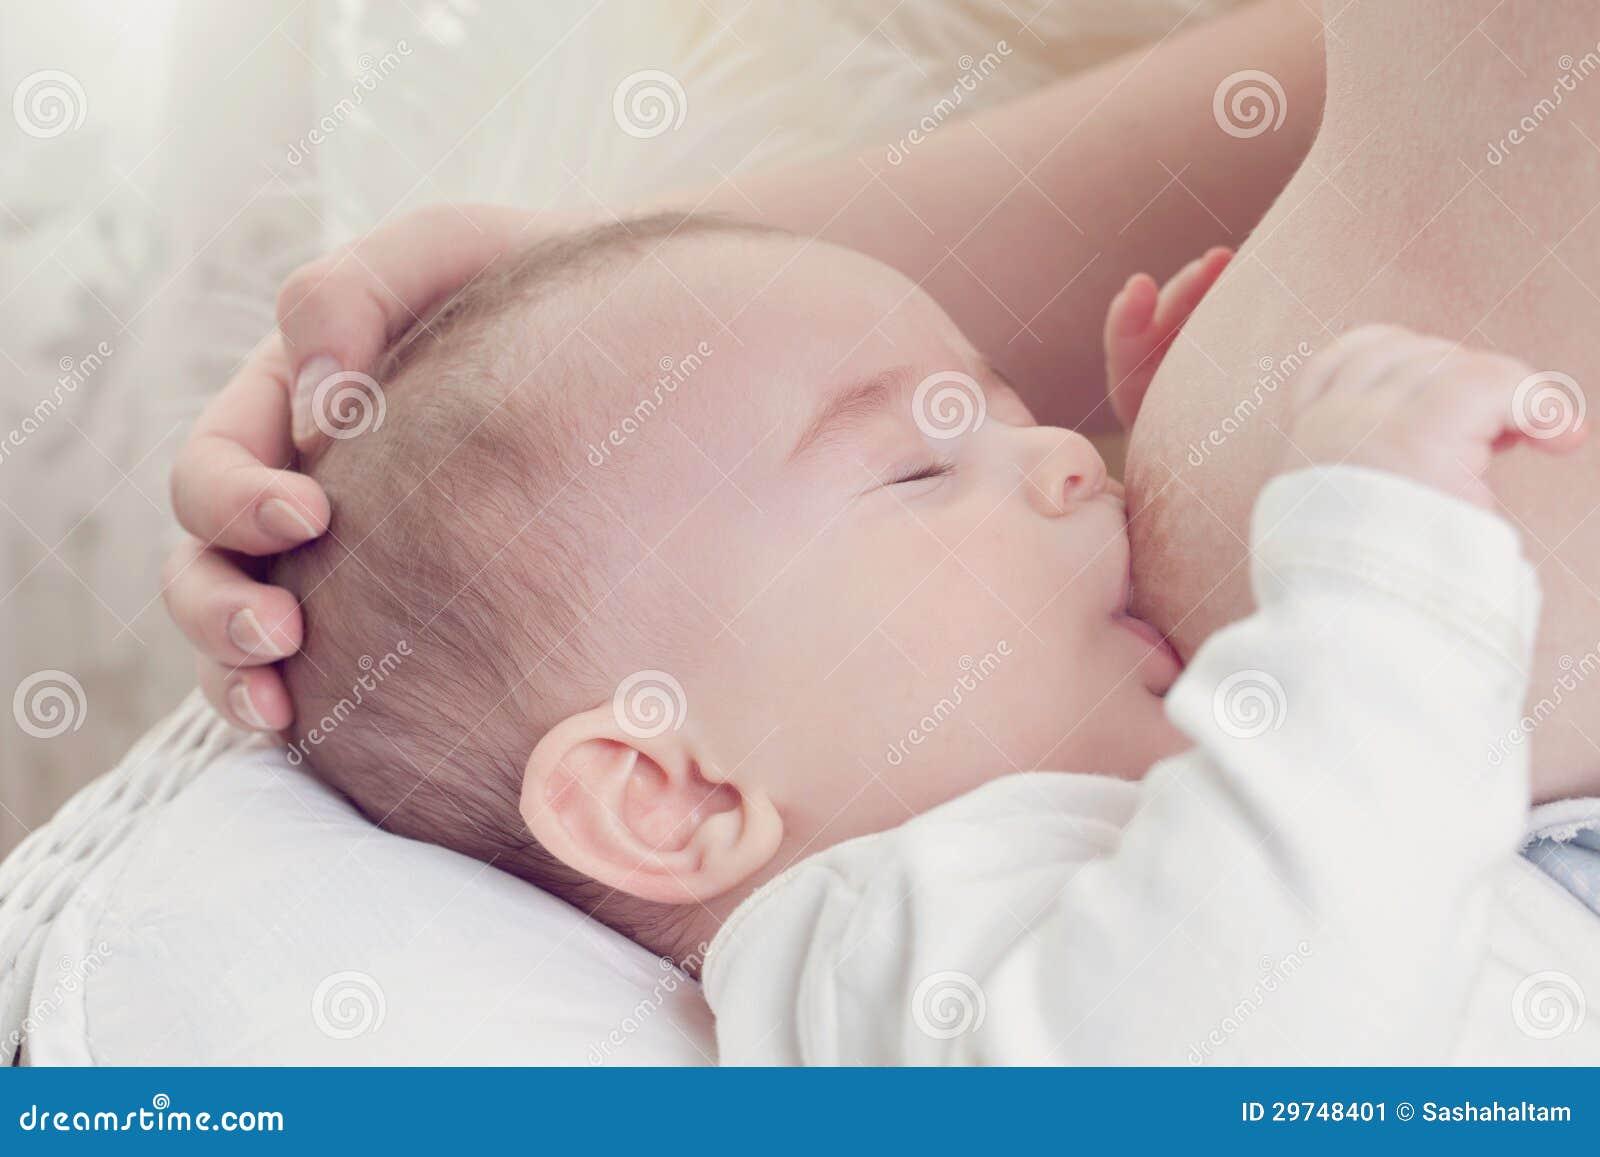 Sucking mom boob in sleeping